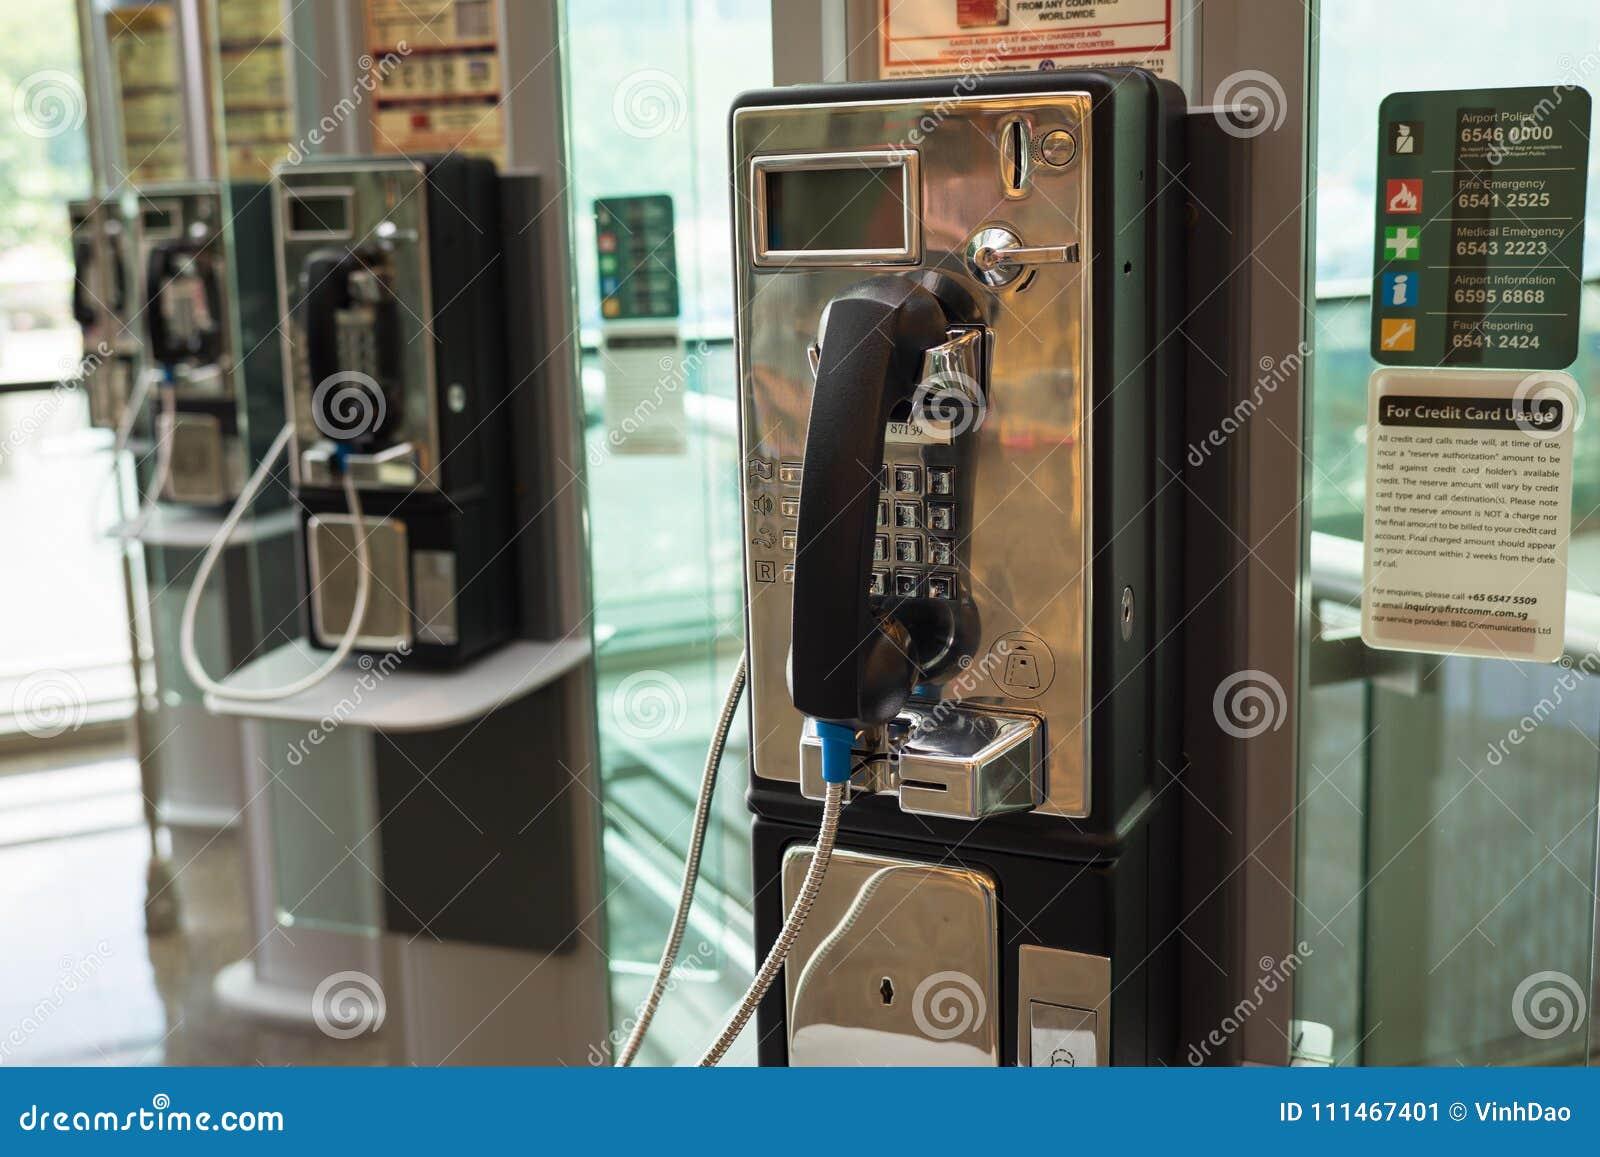 Singapur - 2. Mai 2016: Allgemeines Telefon an Changi-Flughafen, Singapur